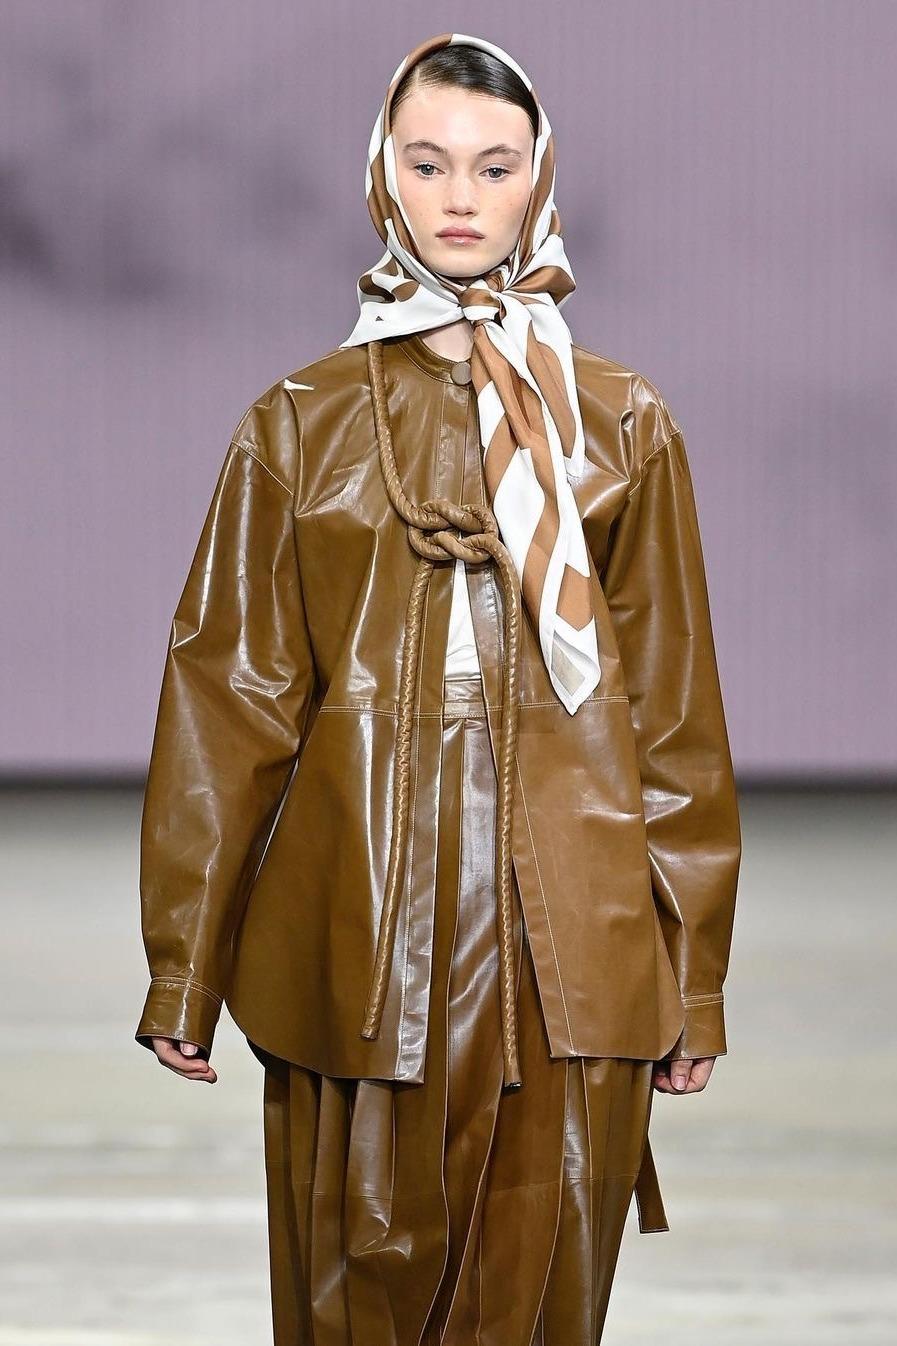 Grace Monfries walks for Next Gen at Australian Fashion Week   Pride Models news